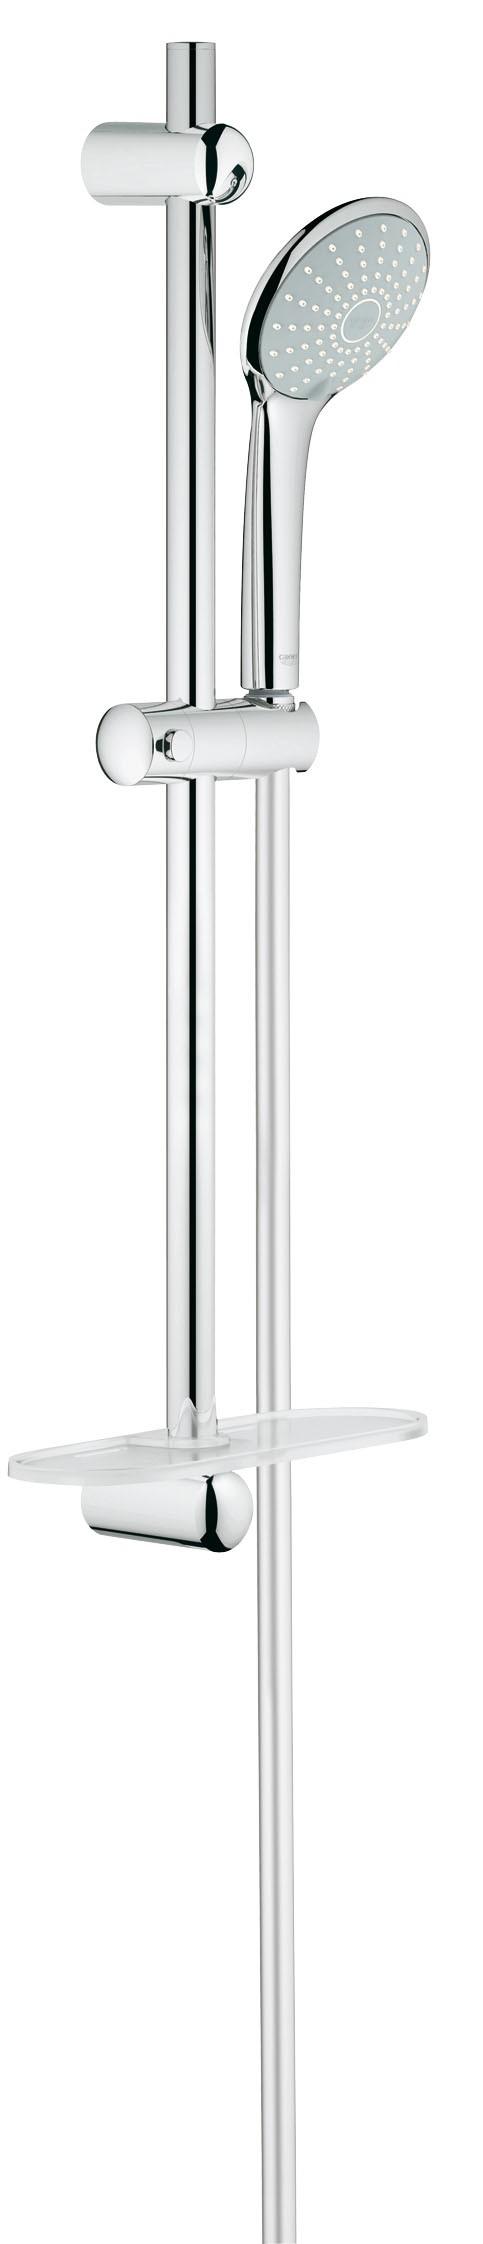 Grohe 27230001 Euphoria (ручной душ, штанга 600 мм, шланг 1750 мм), хром (27230001)